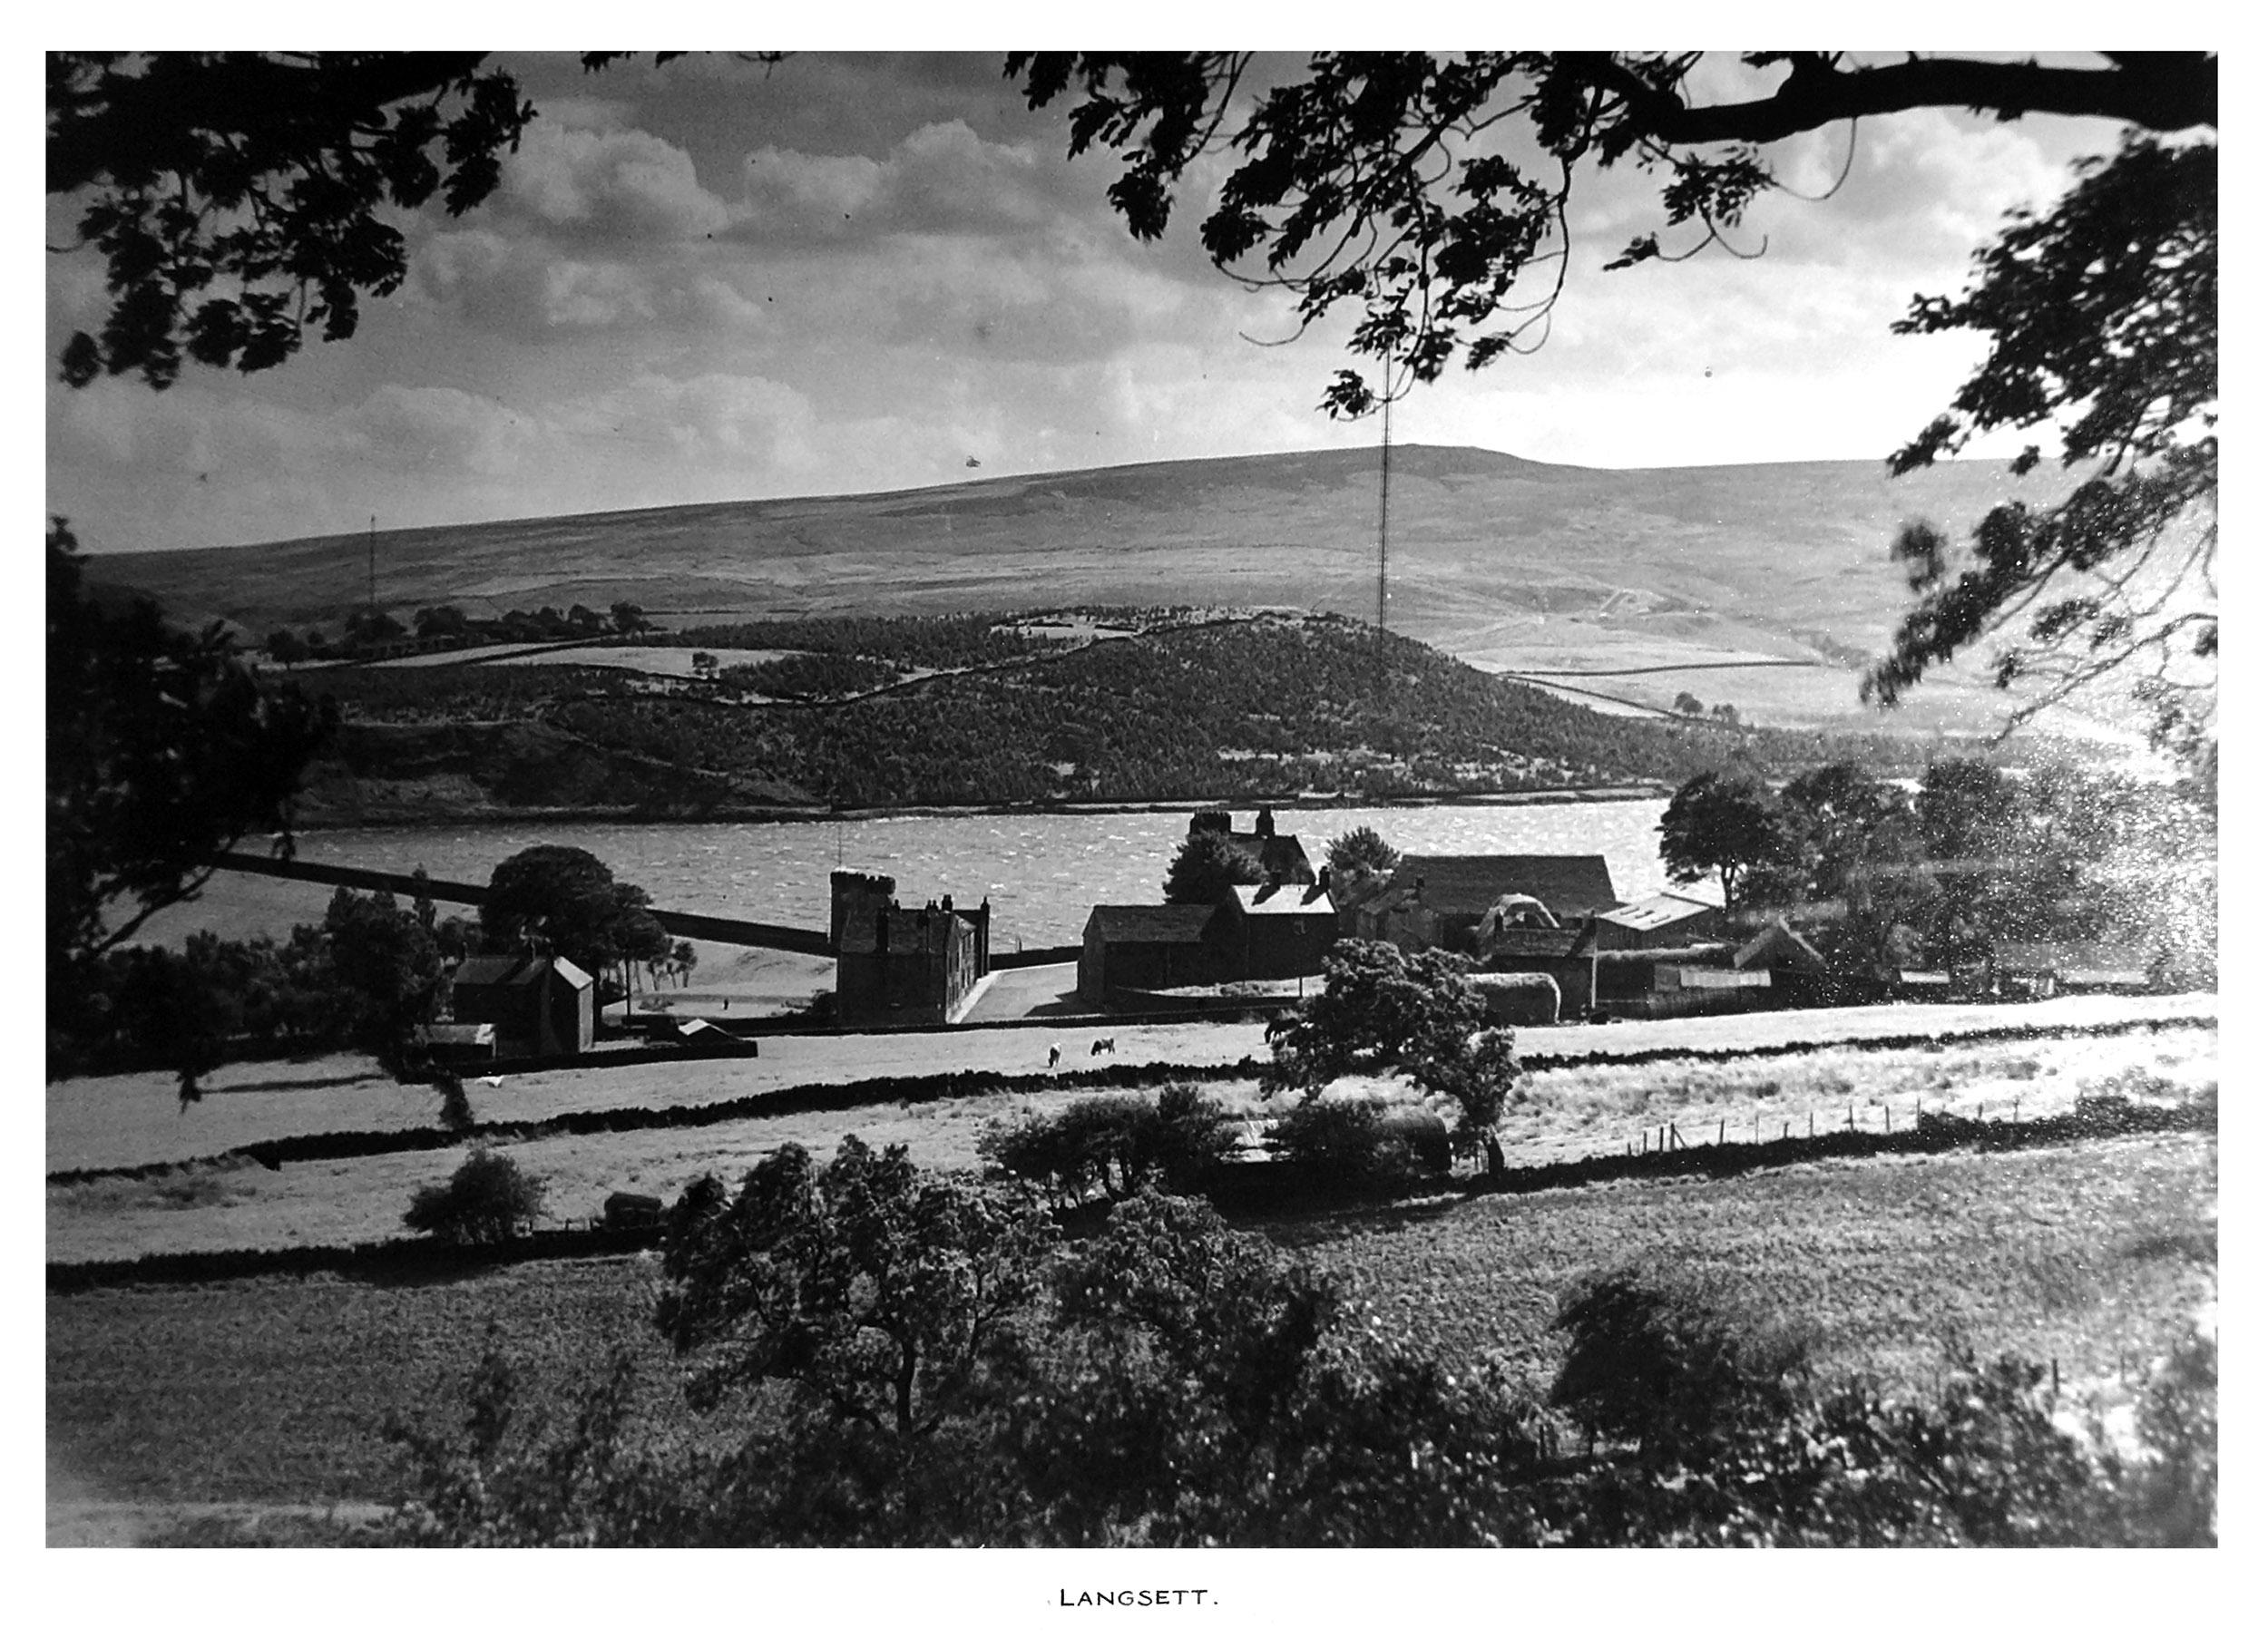 Langsett Dam Historical Photography 1942